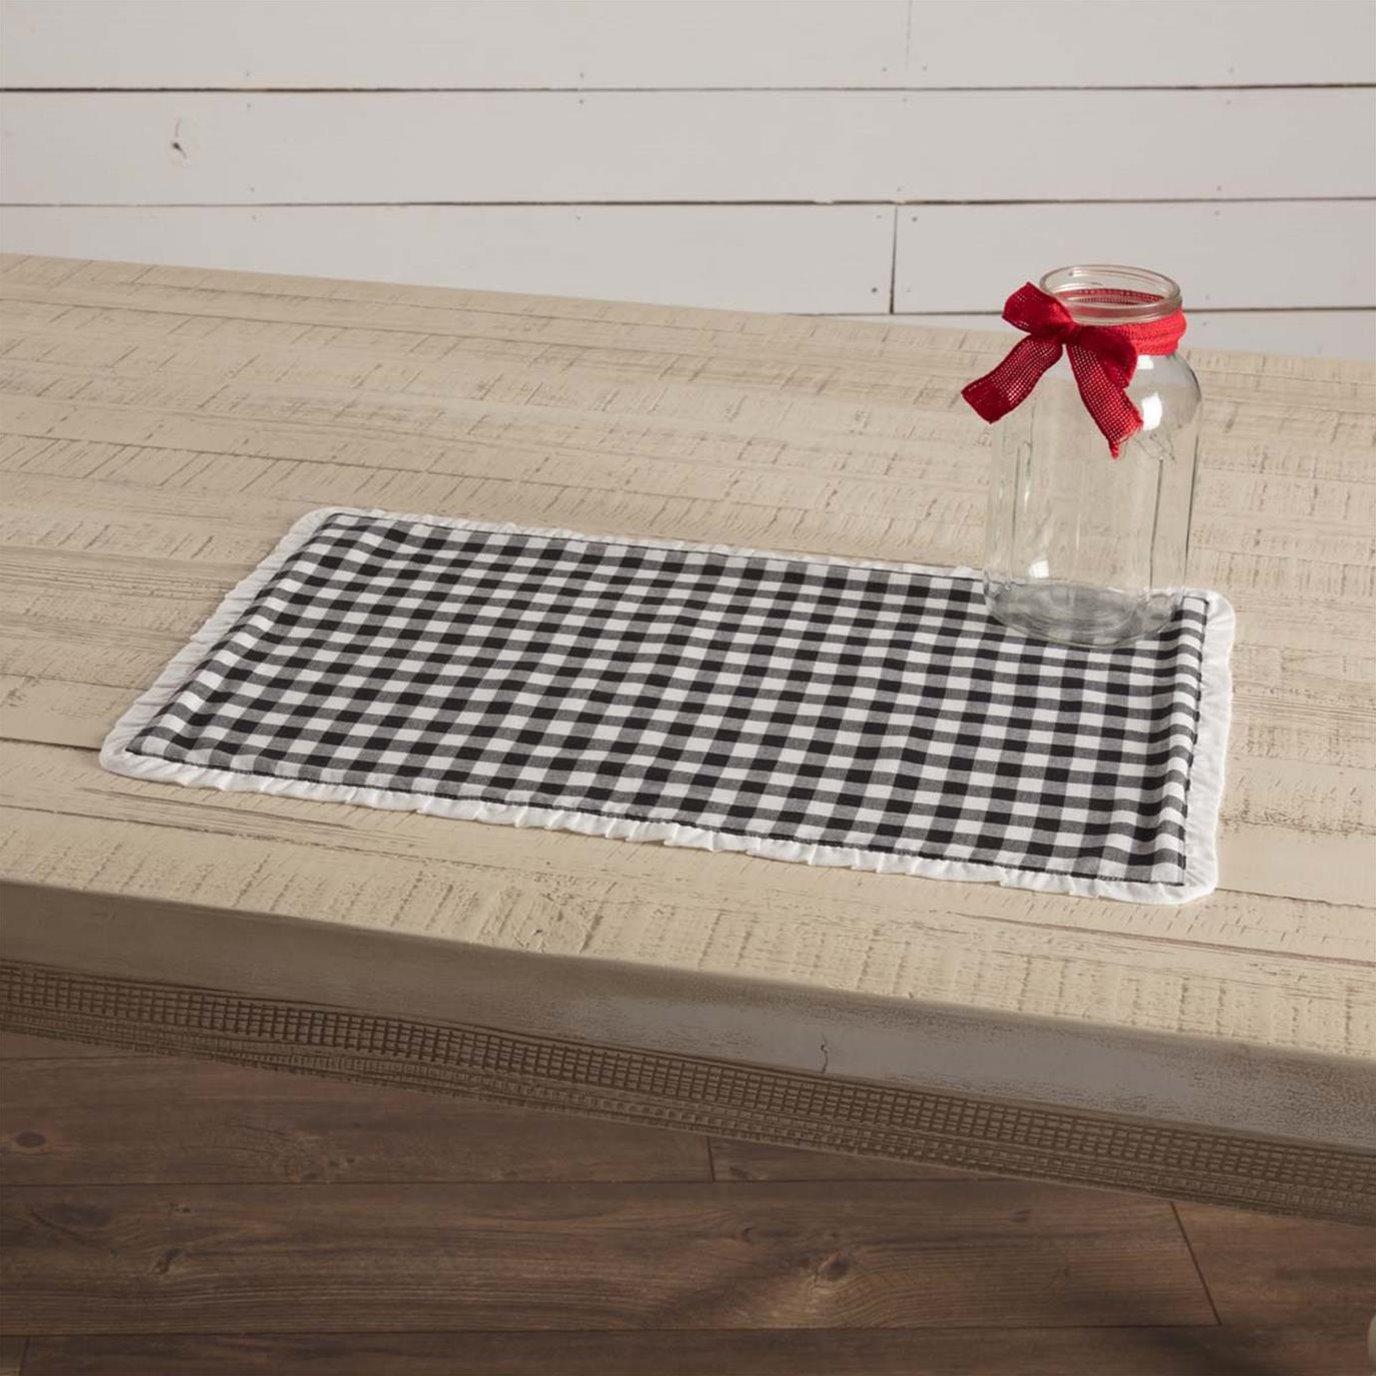 Emmie Black Placemat Set of 6 12x18